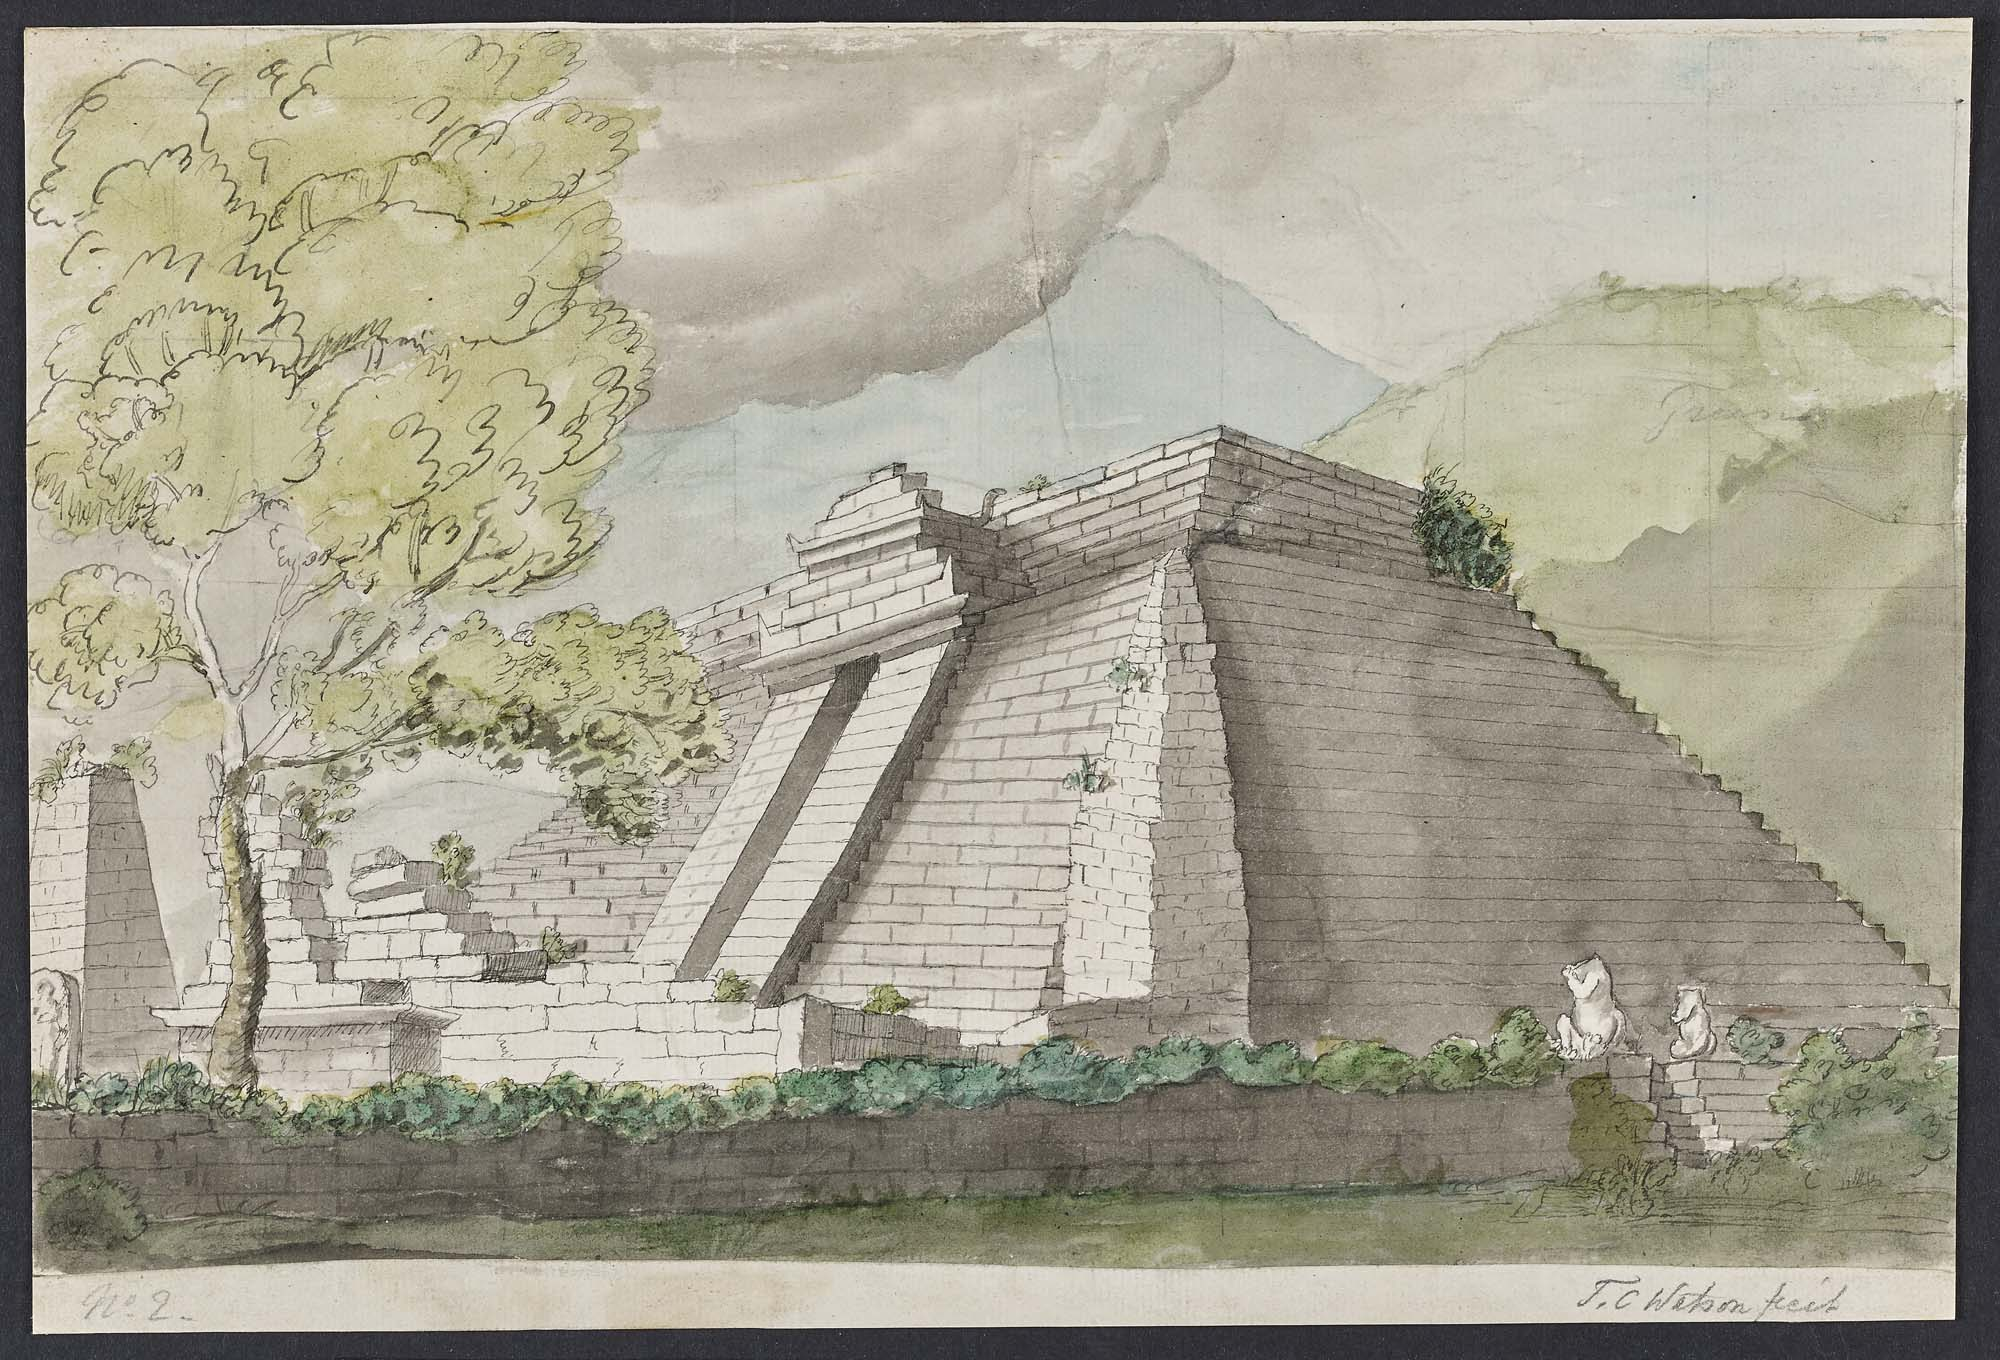 a watercolour of a Javan temple